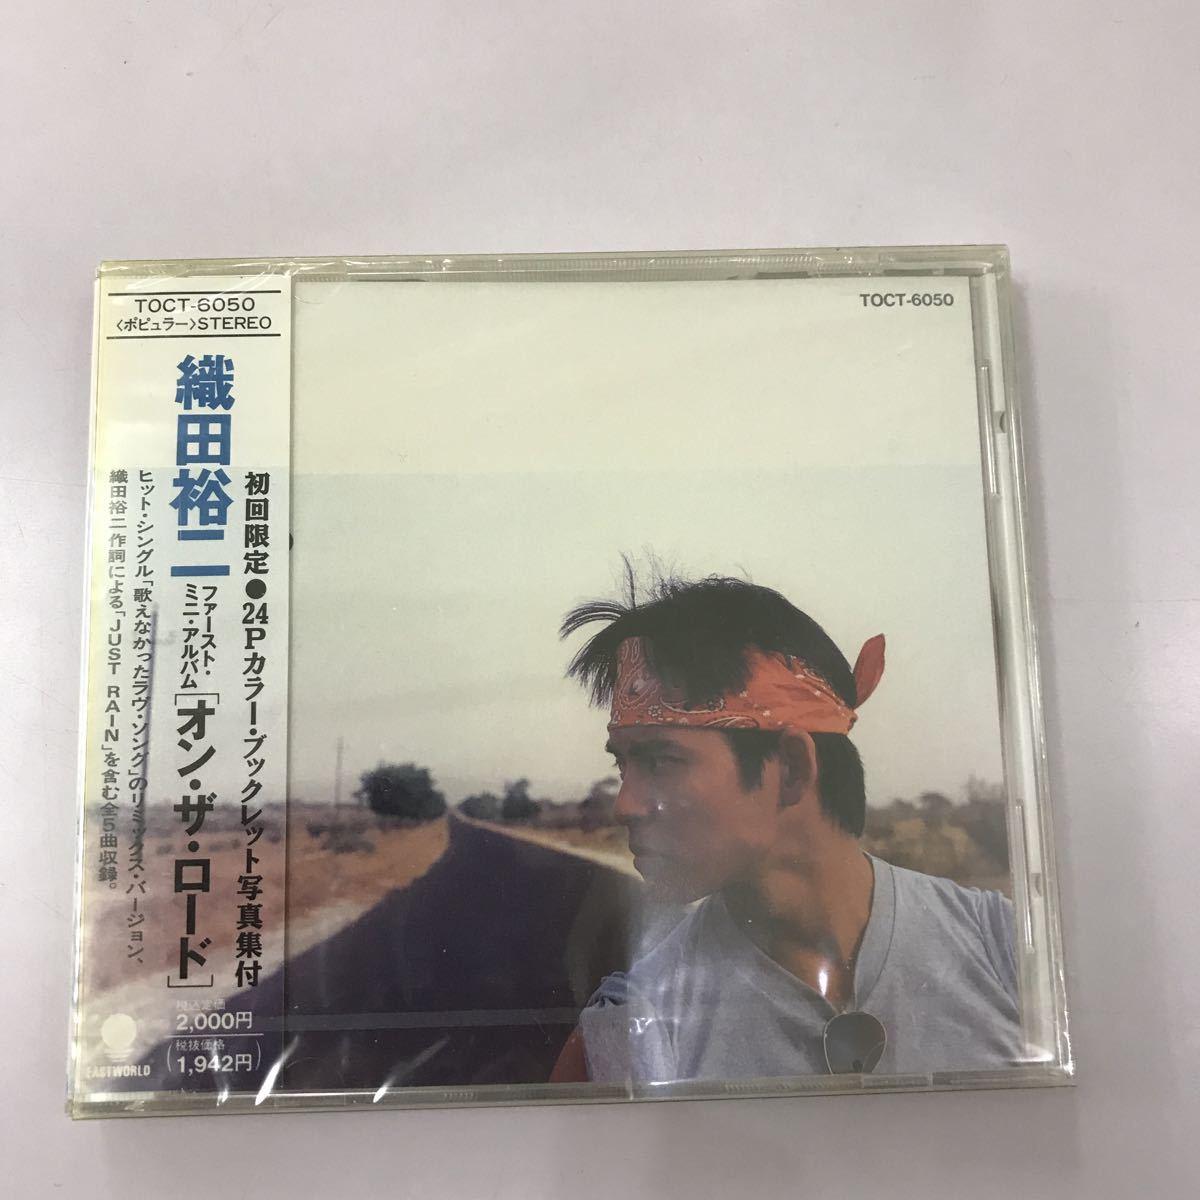 CD 新品未開封 長期保存品【邦楽】織田裕二 オン ザ ロード